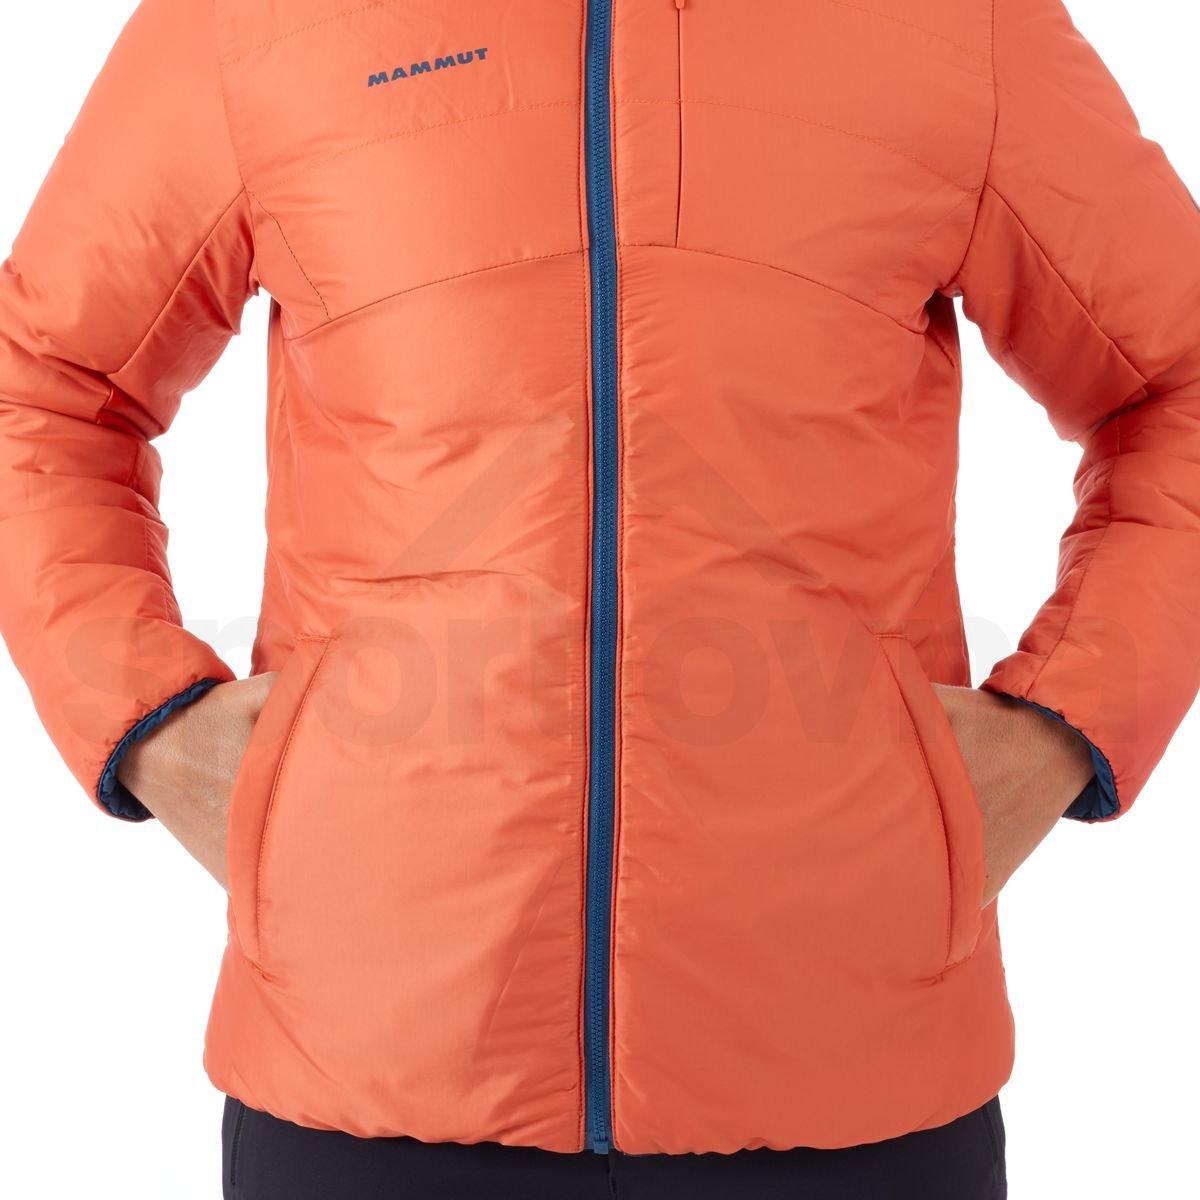 Bunda Mammut Whitehorn IN Jacket - modrá / oranžová